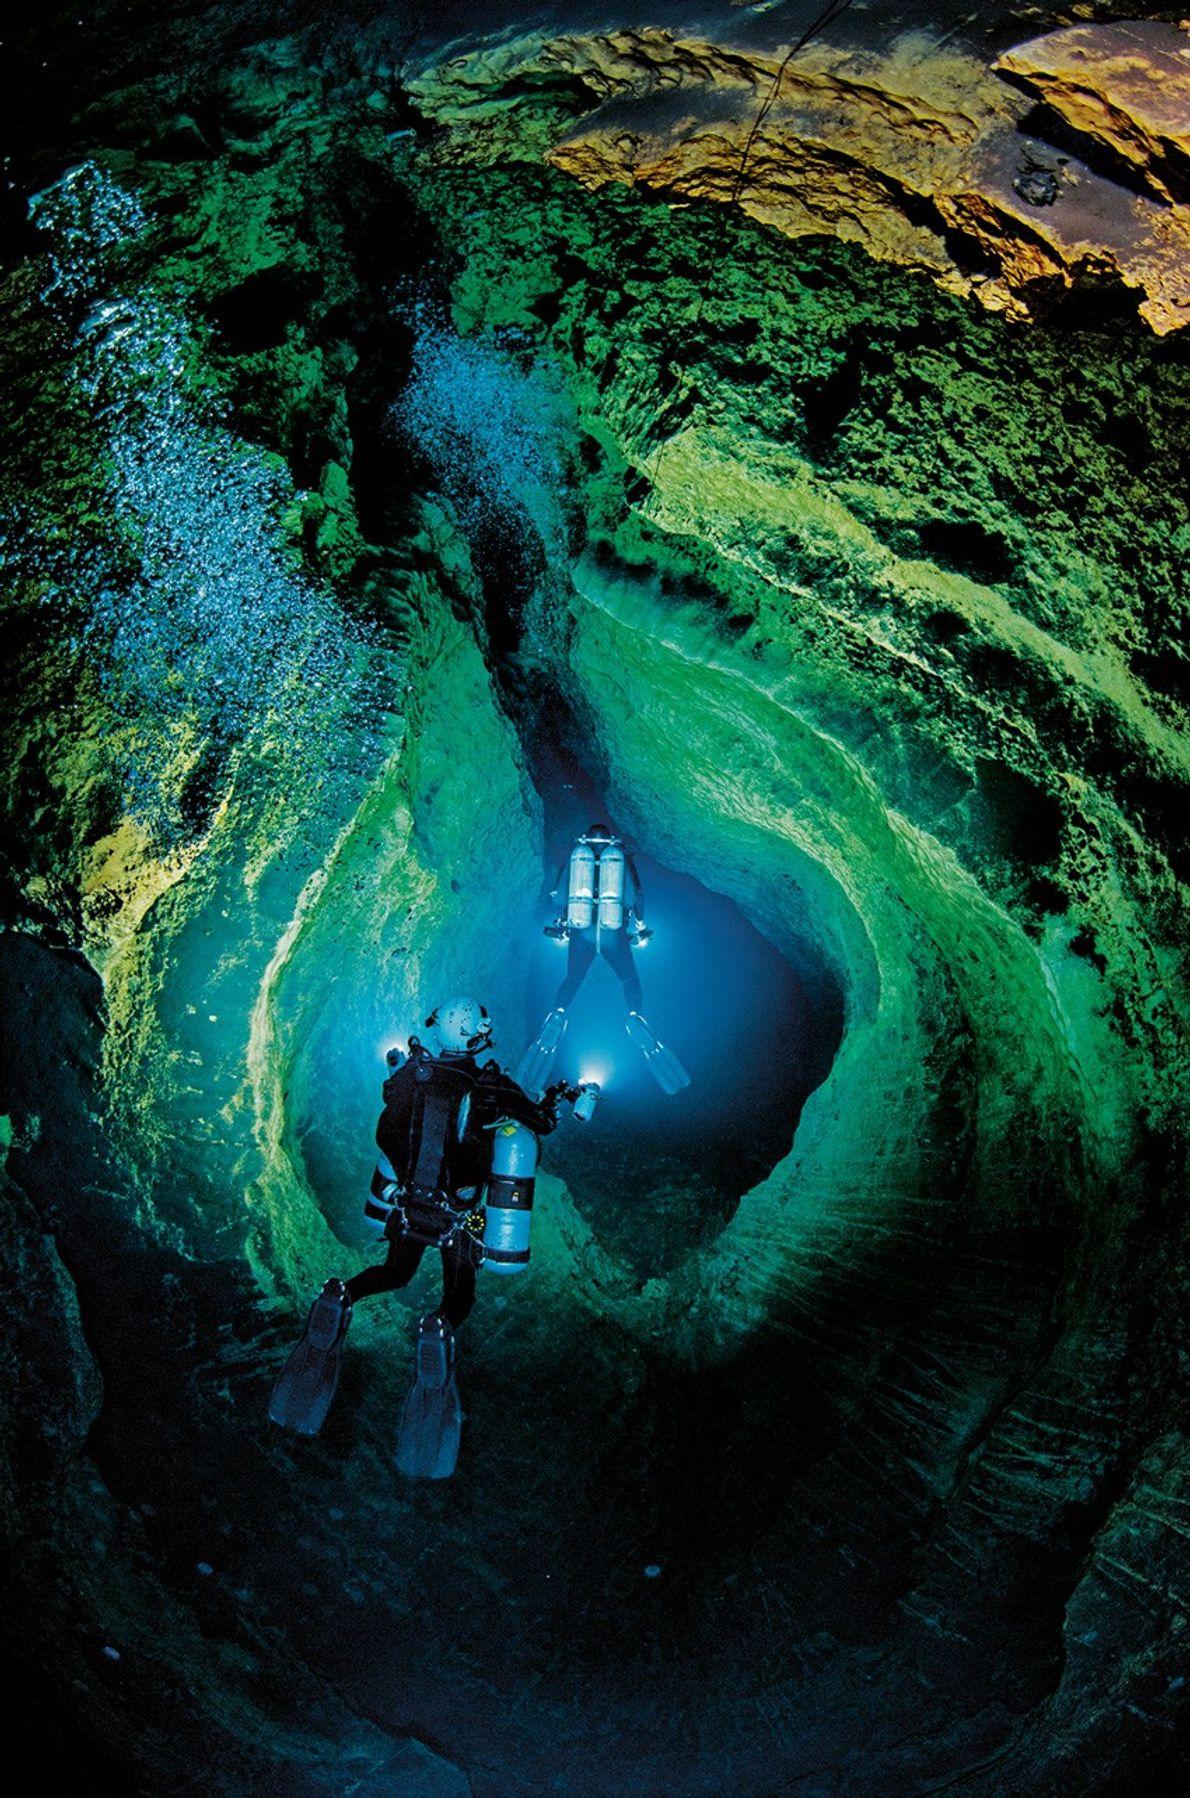 Grottes sous-marine